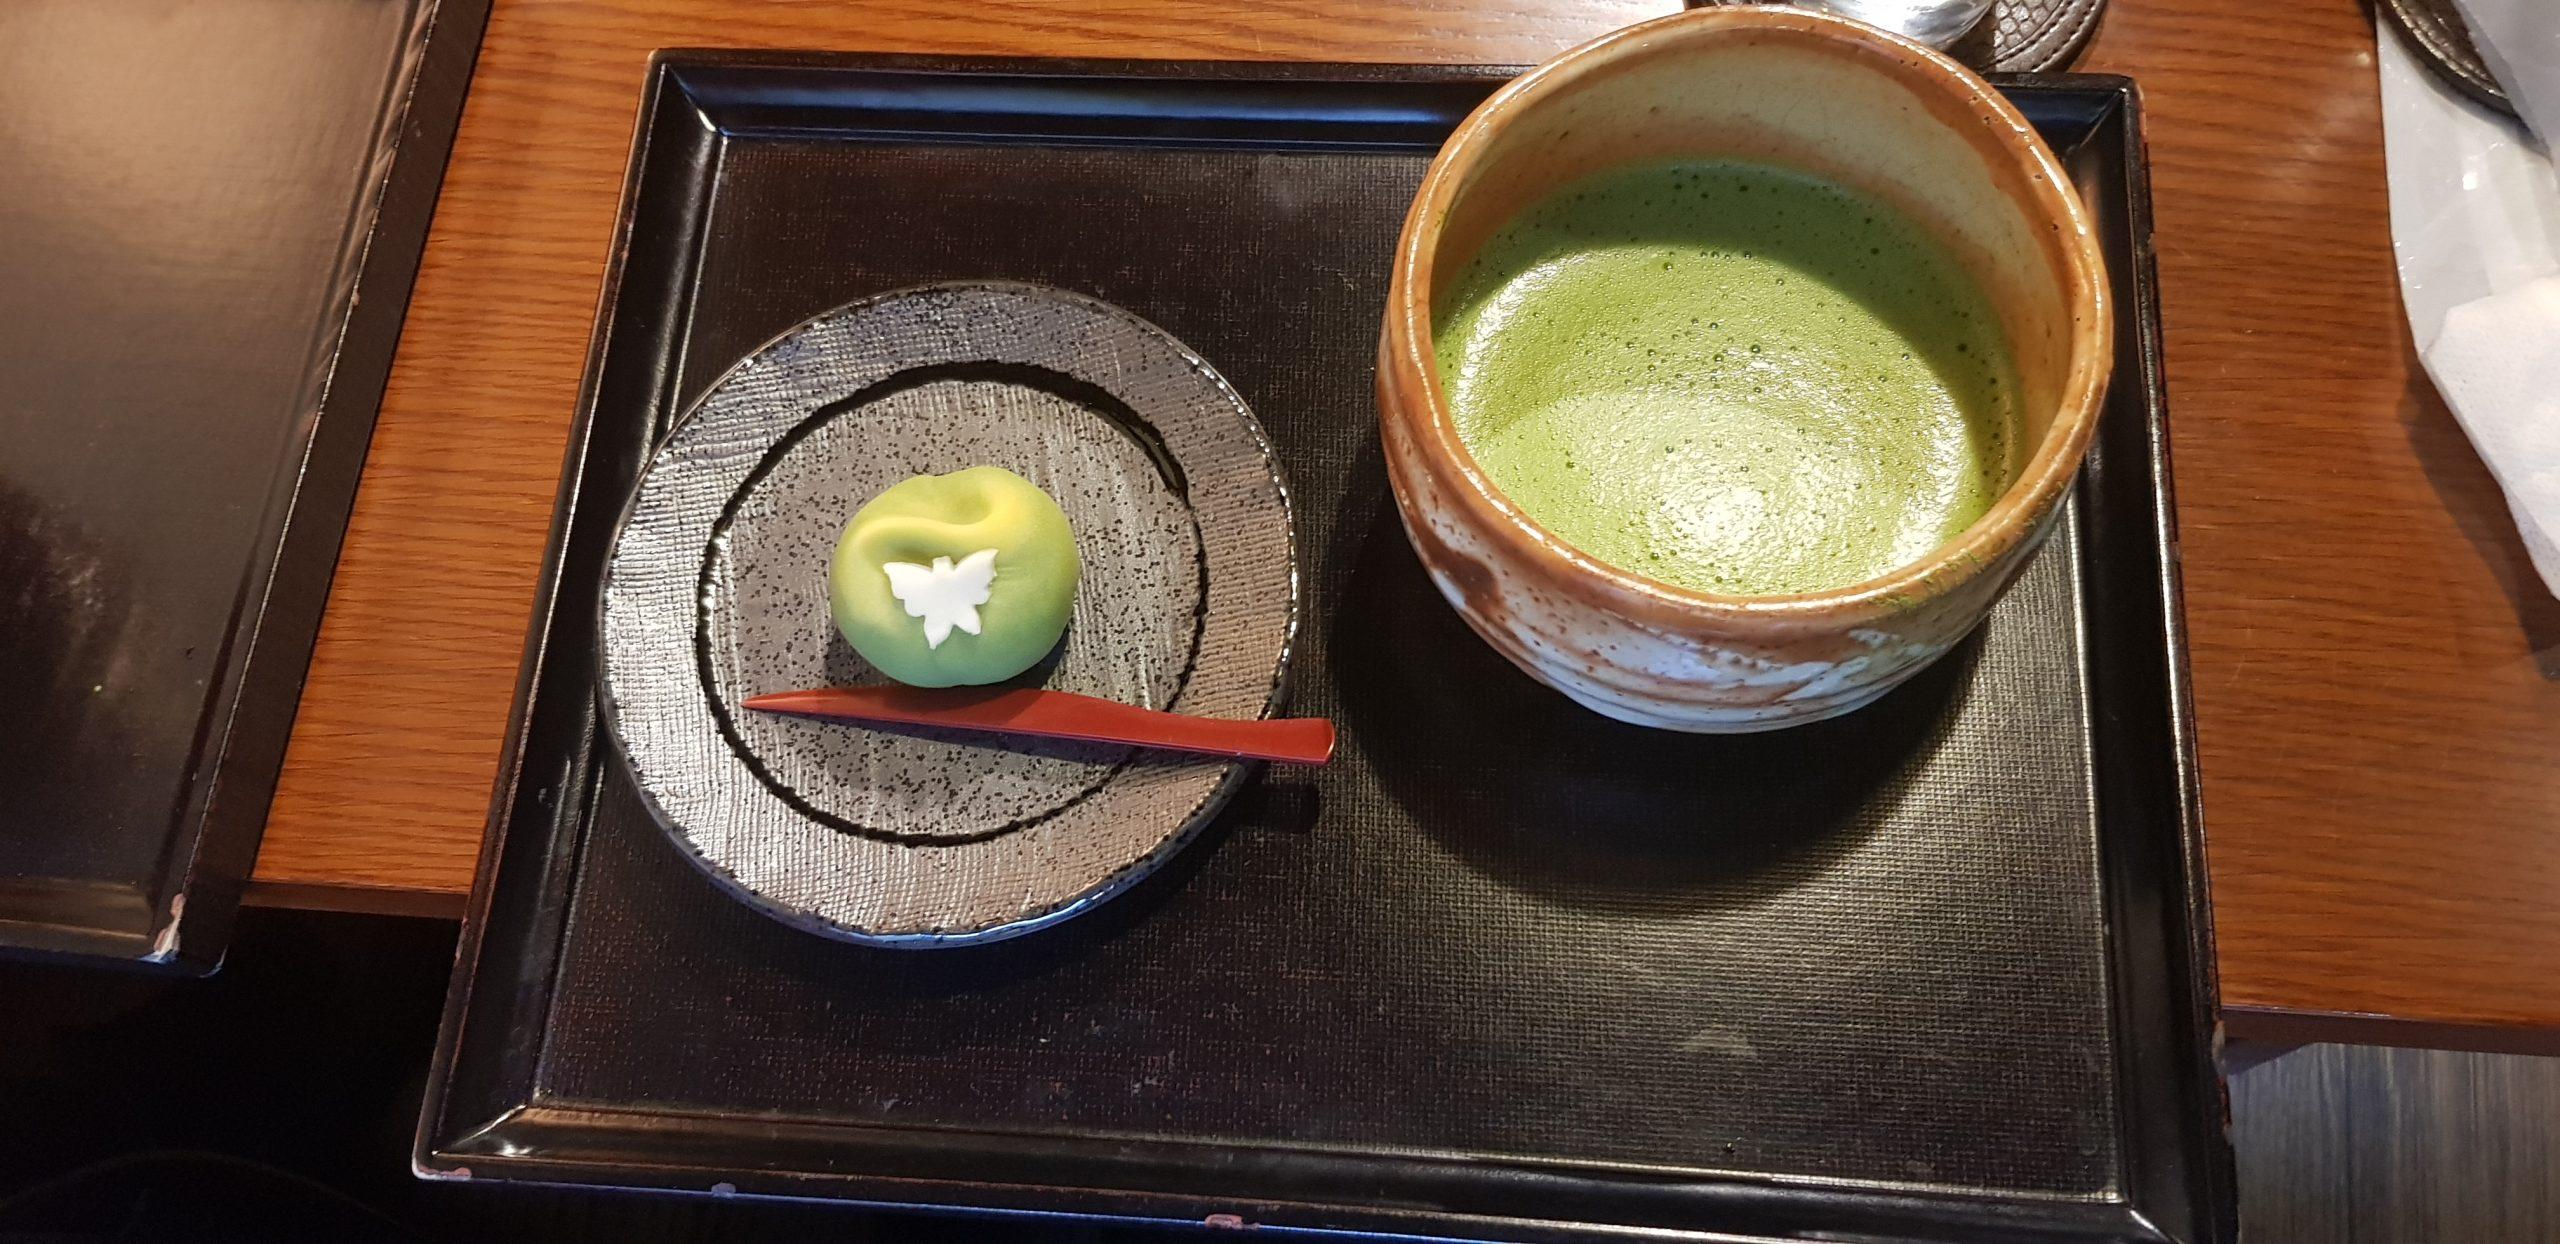 Matcha and wagashi